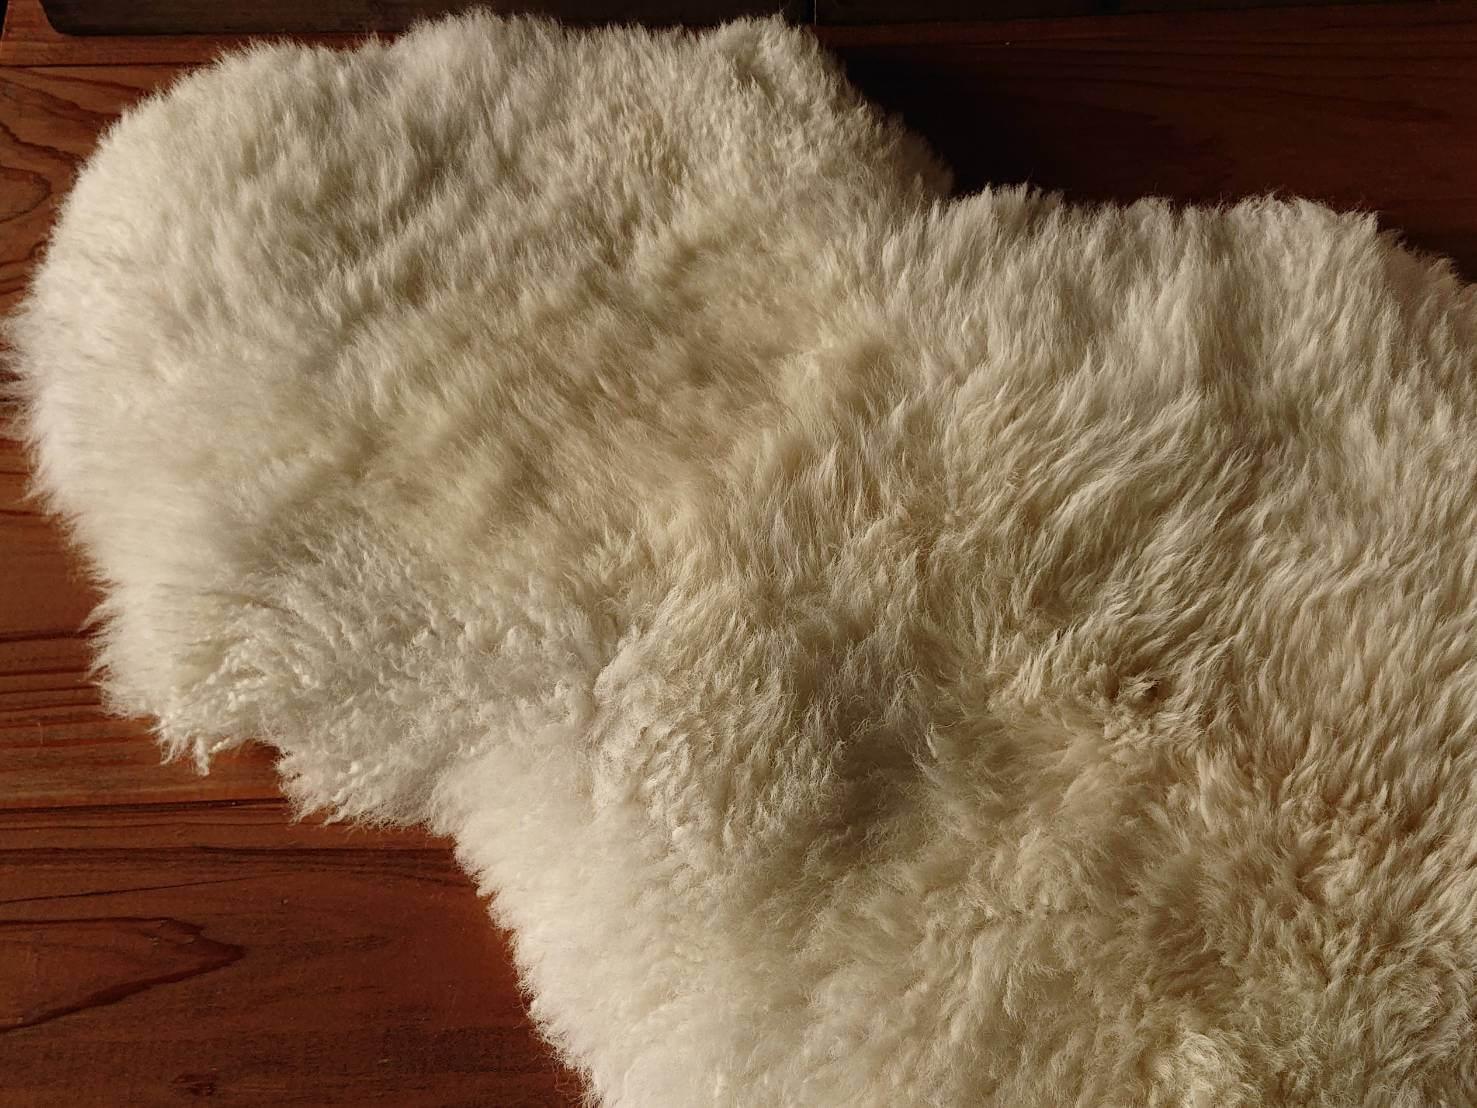 GLENCROFT Sheepskin Rug グレンクロフト シープスキンラグ